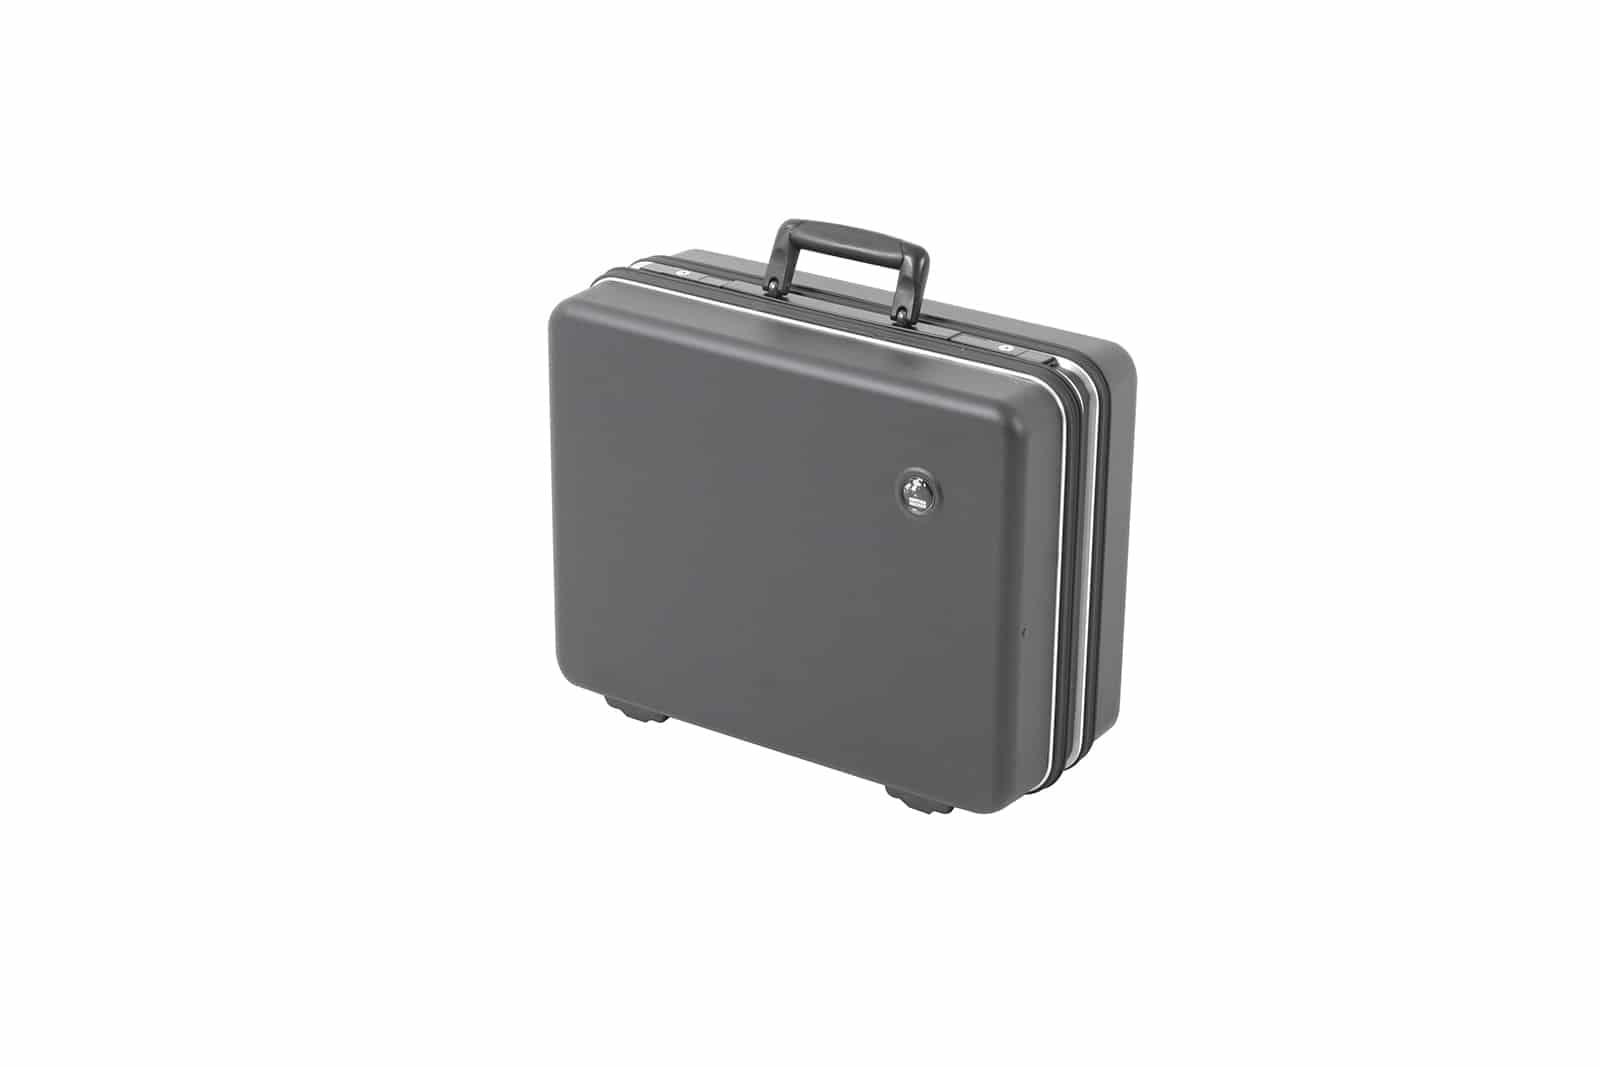 Werkzeugkoffer Classic 5182 ABS Pro 34 ltr. XL